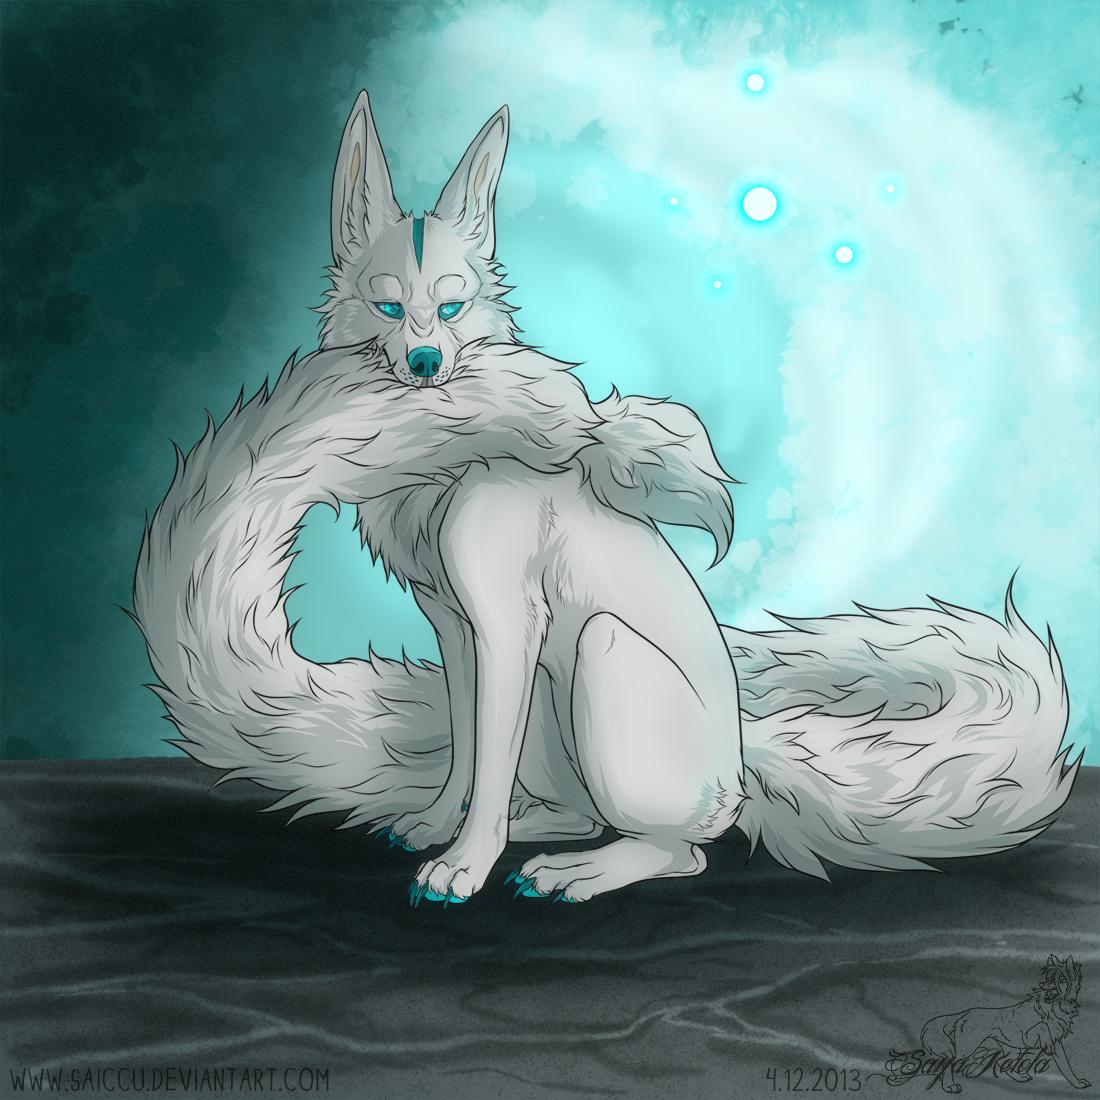 Turquoise dreams by Saiccu